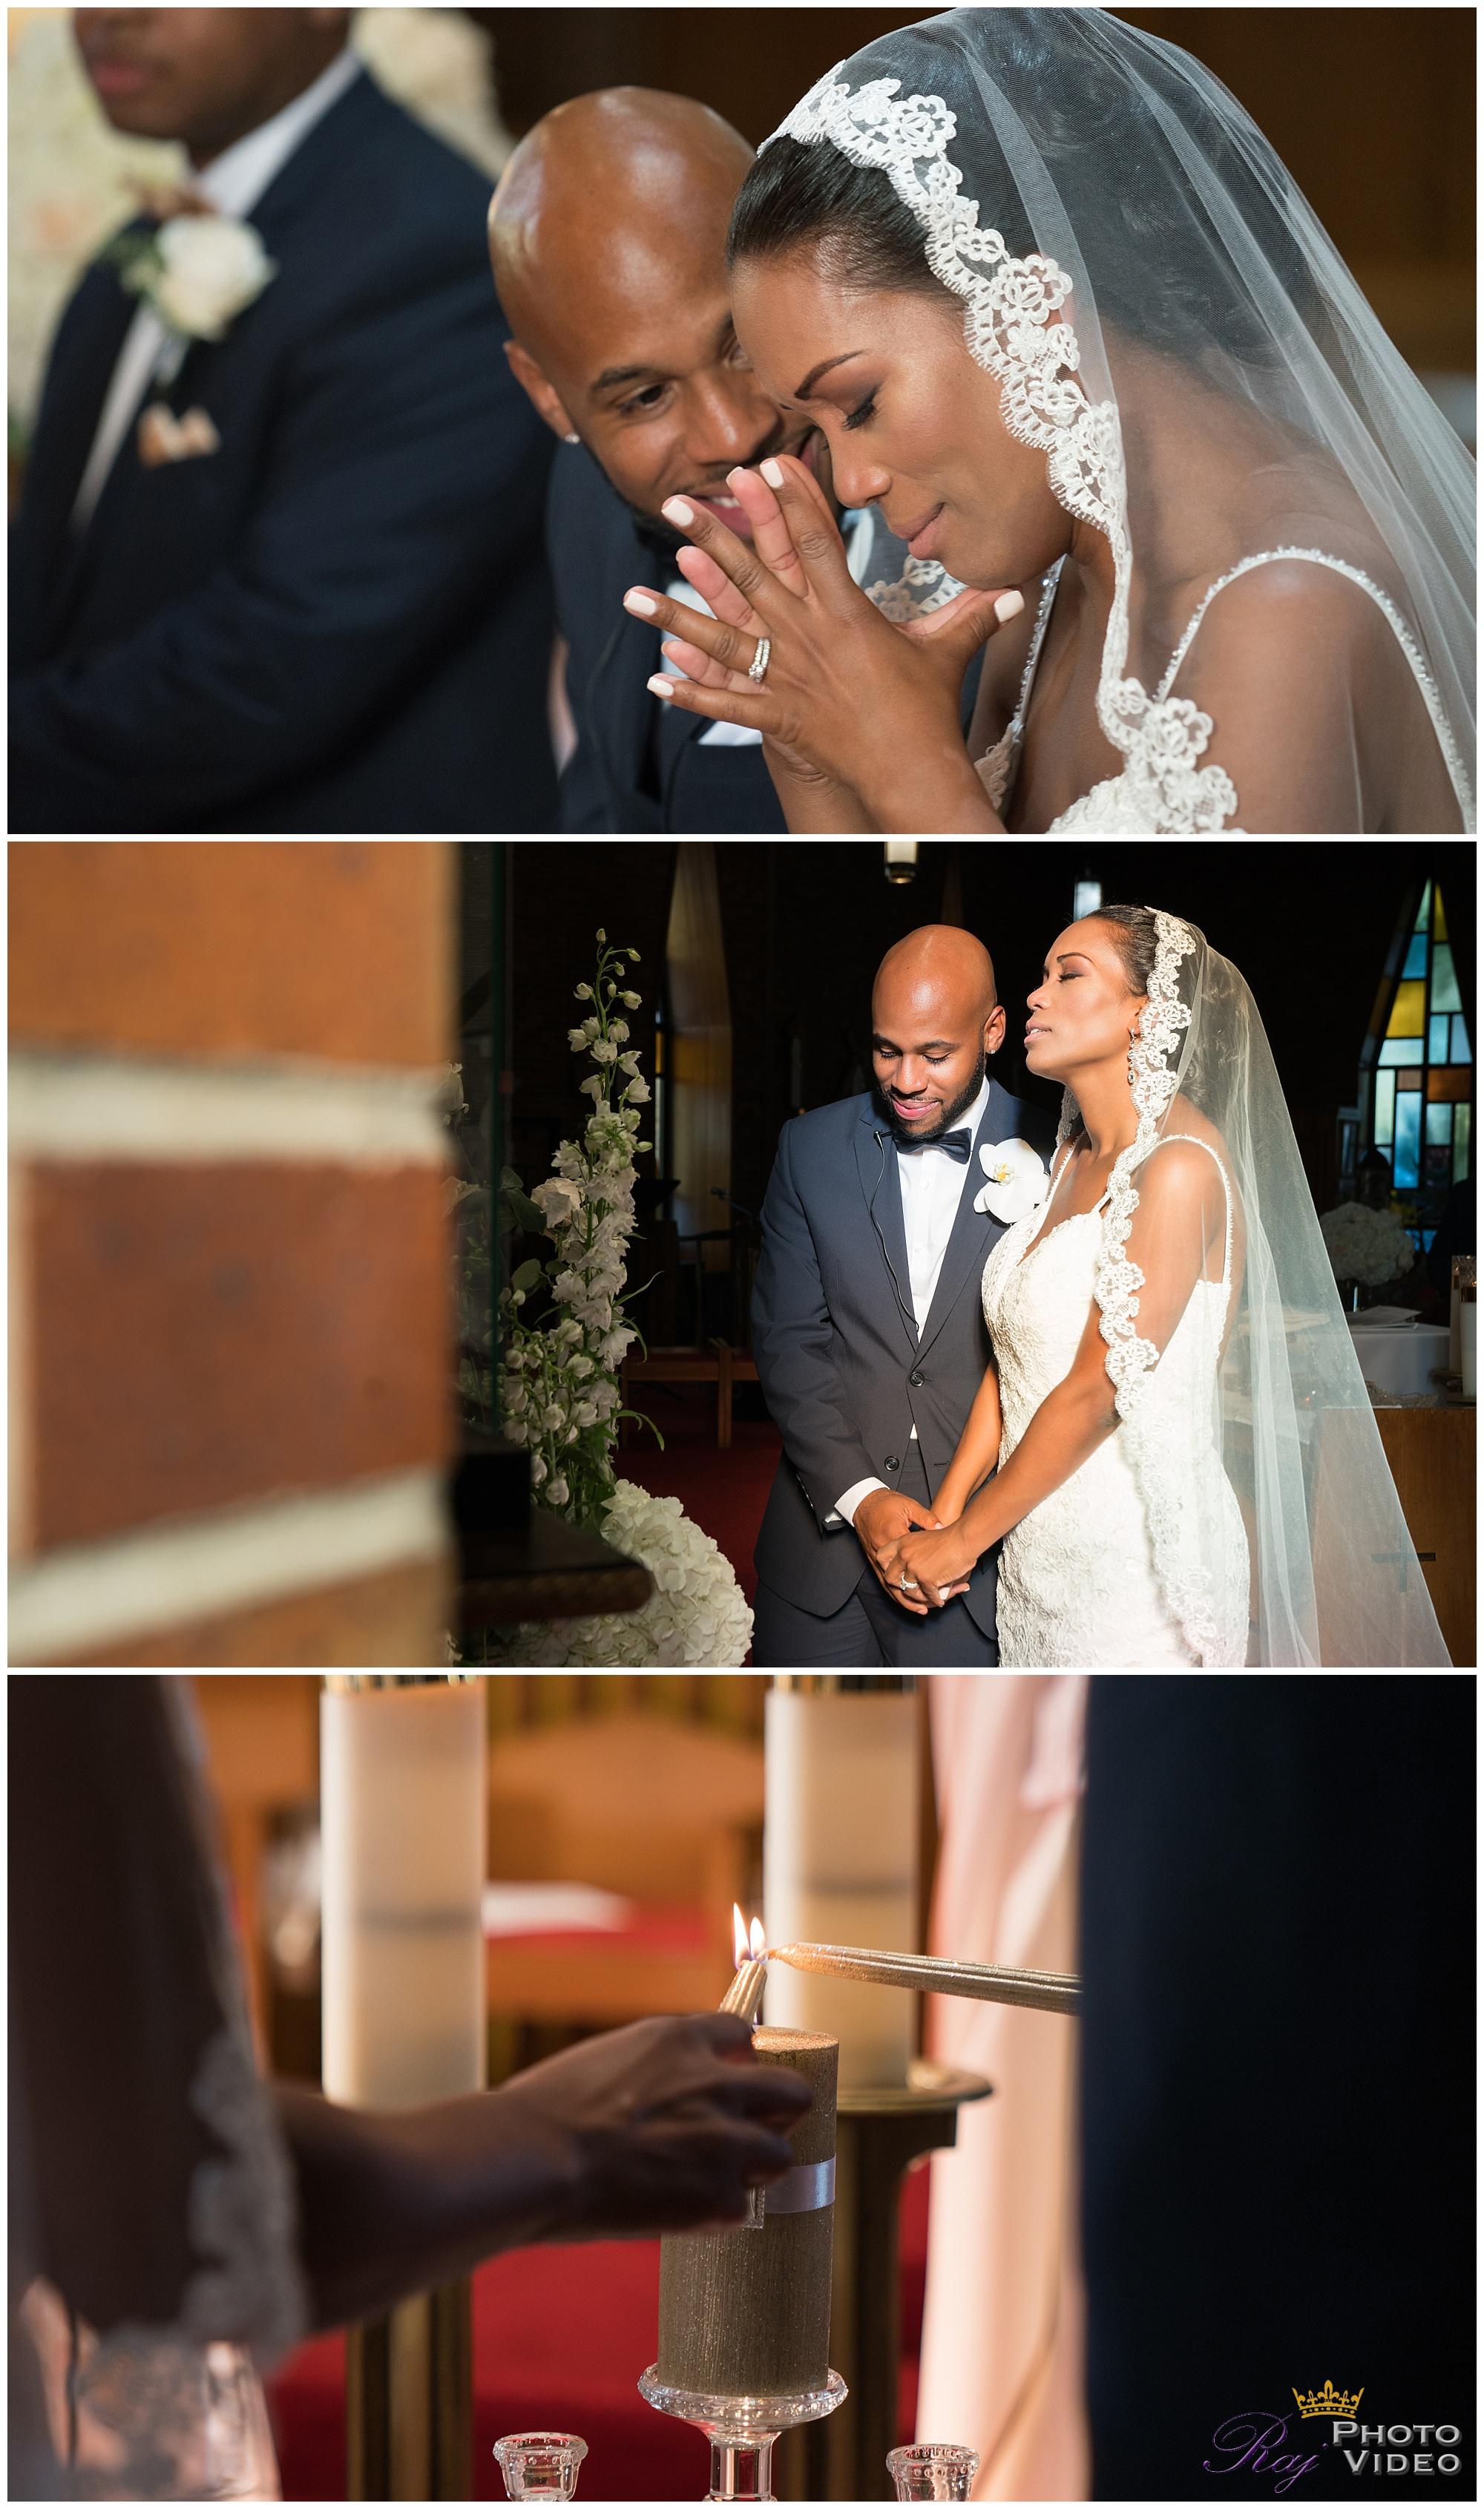 The-Armory-Perth-Amboy-NJ-Catholic-Wedding-Yudelkis-Stephen-10.jpg